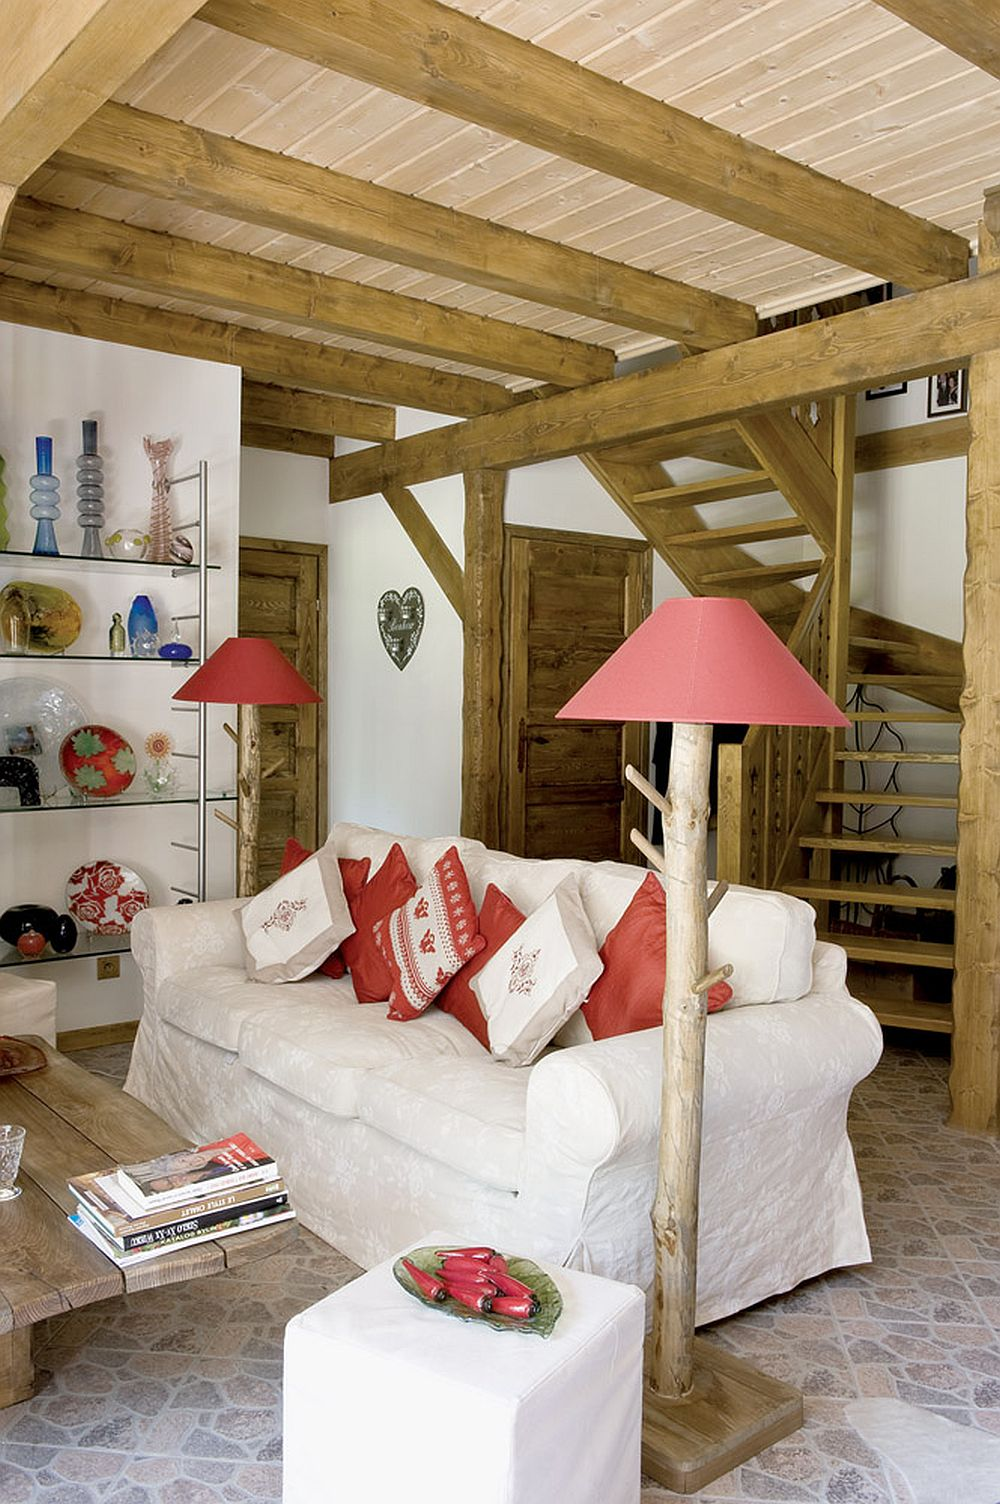 adelaparvu.com despre casa rustica cu influente franceze Foto Cuba Pajewski (9)